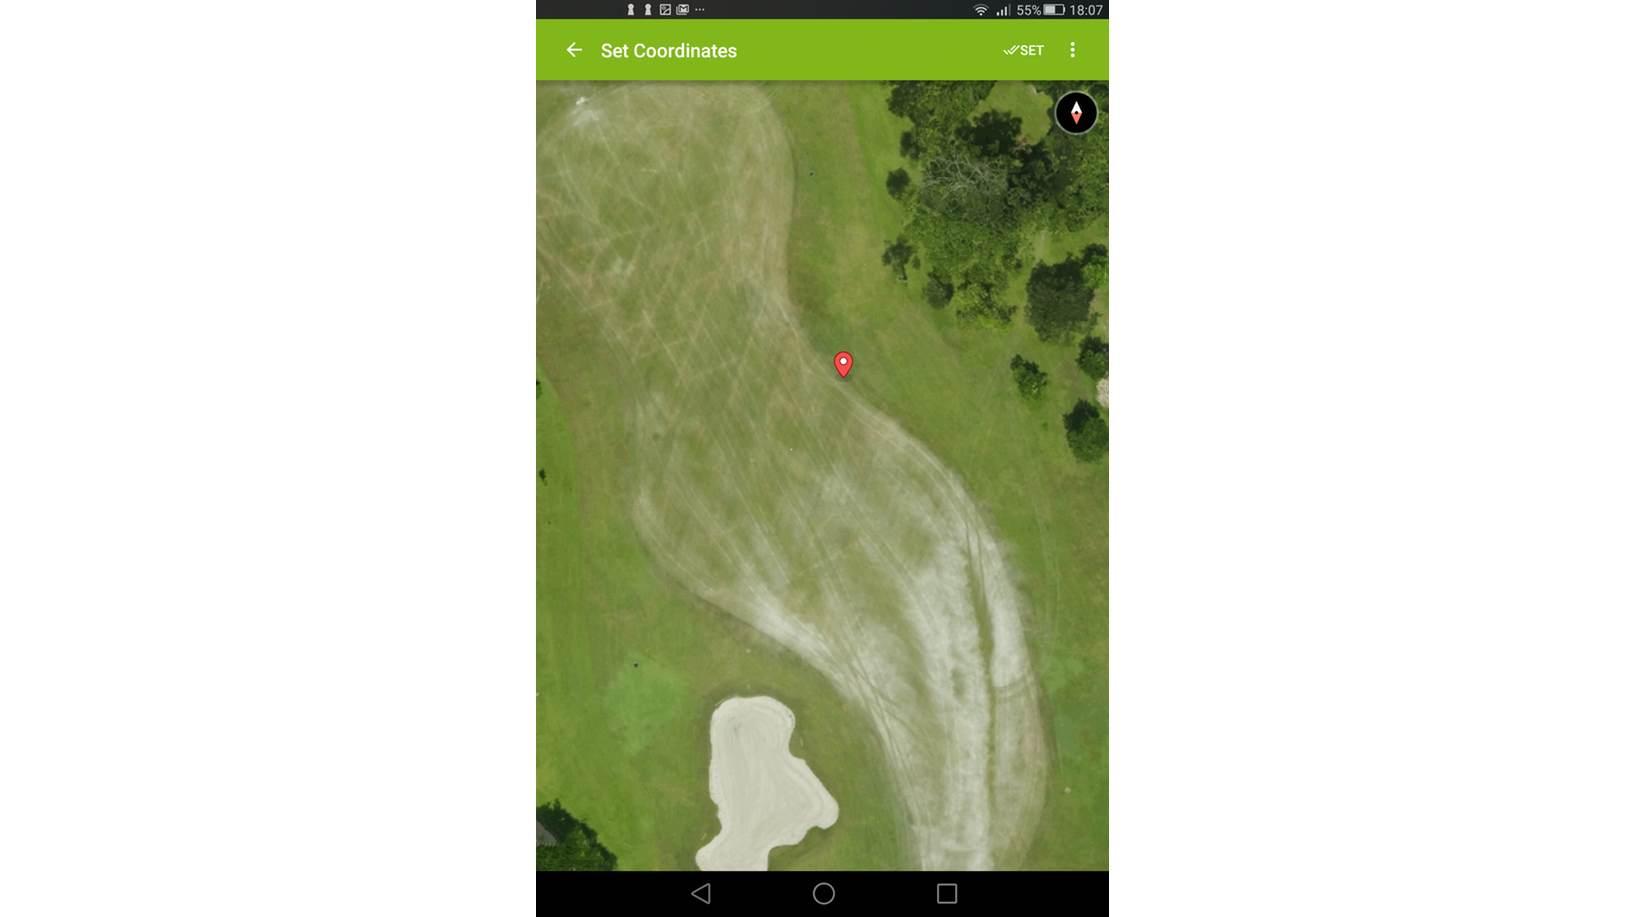 mapgage fieldapp screenshot golf issue record list detailed map view